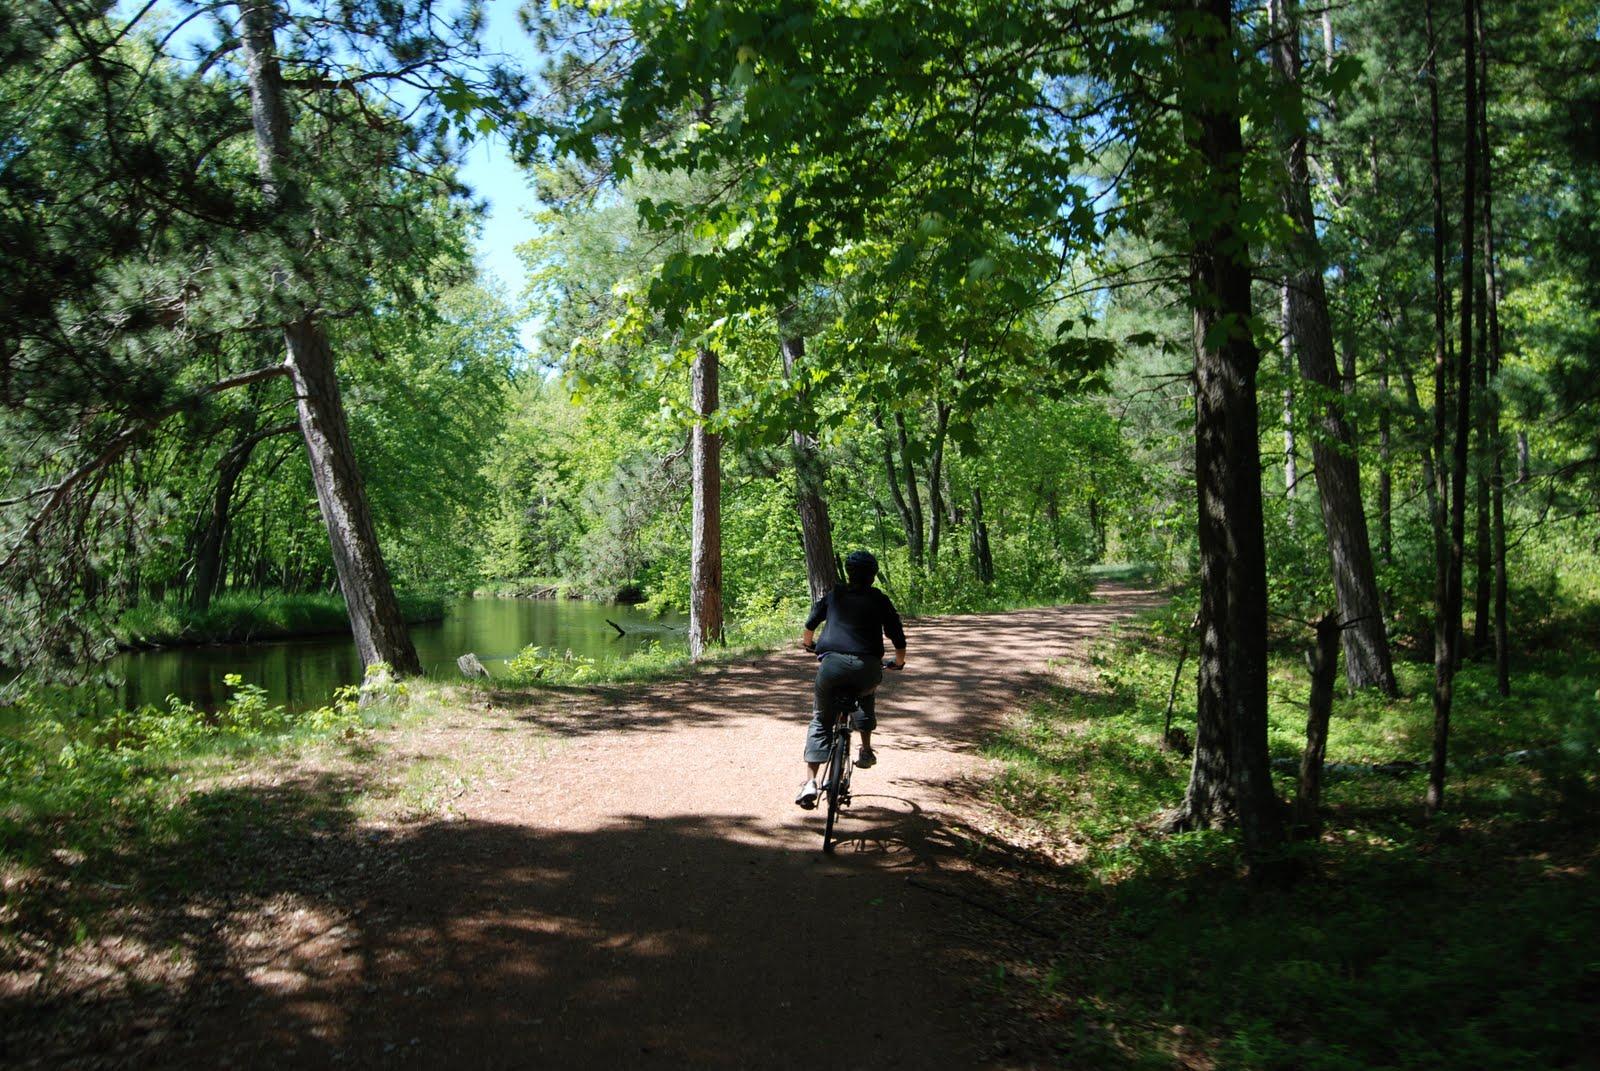 Biking the Plover River Trail. Photo by Jim Buchholz